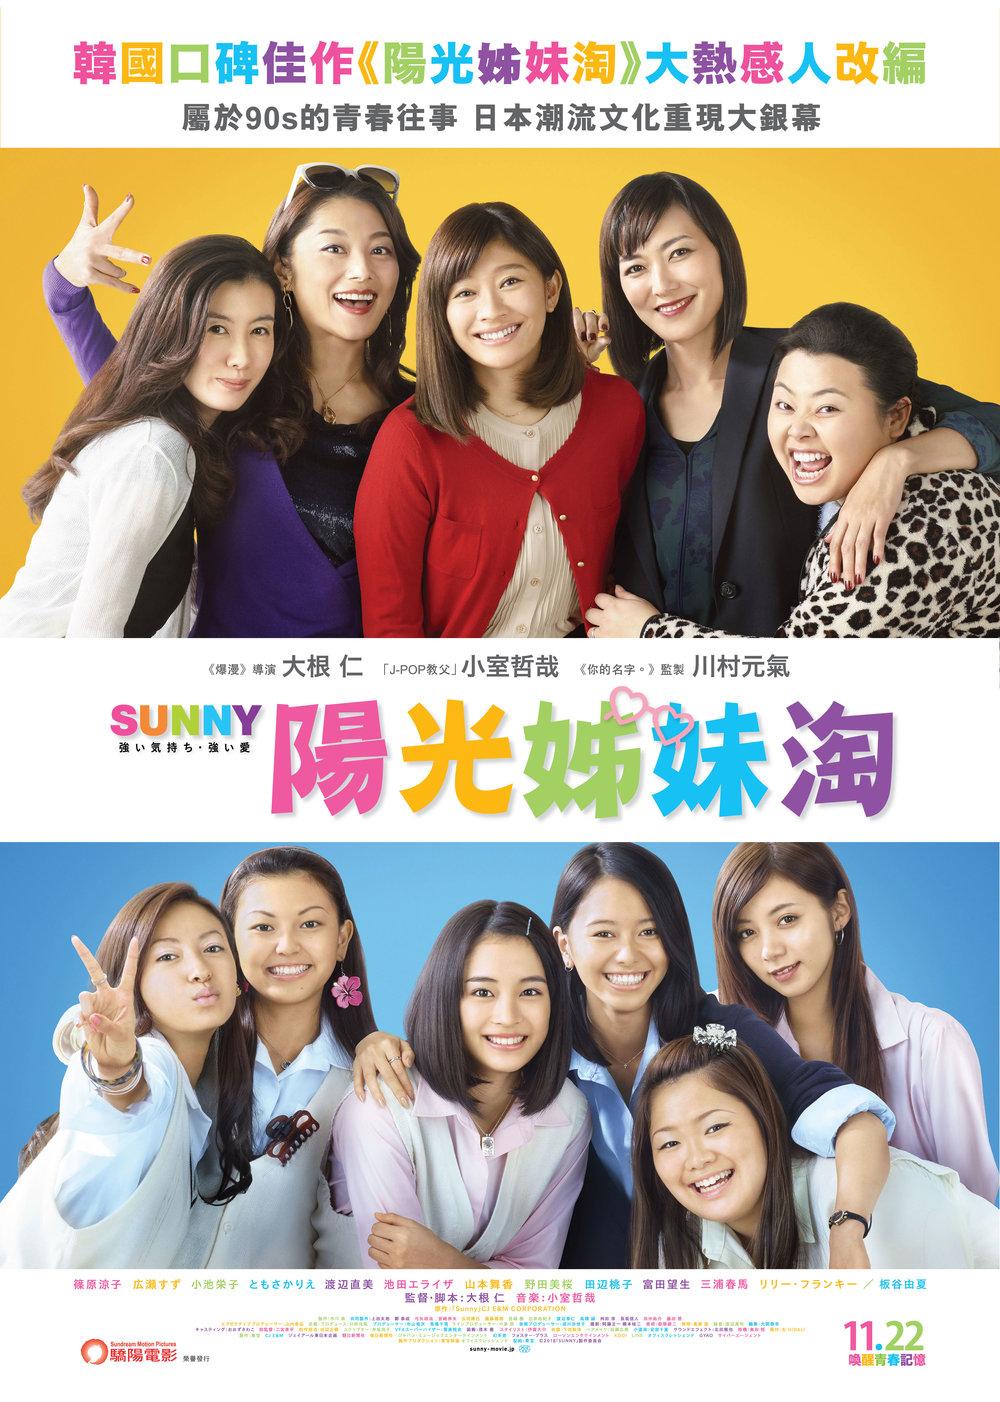 Sunny 27x38 main poster A6-01.jpg